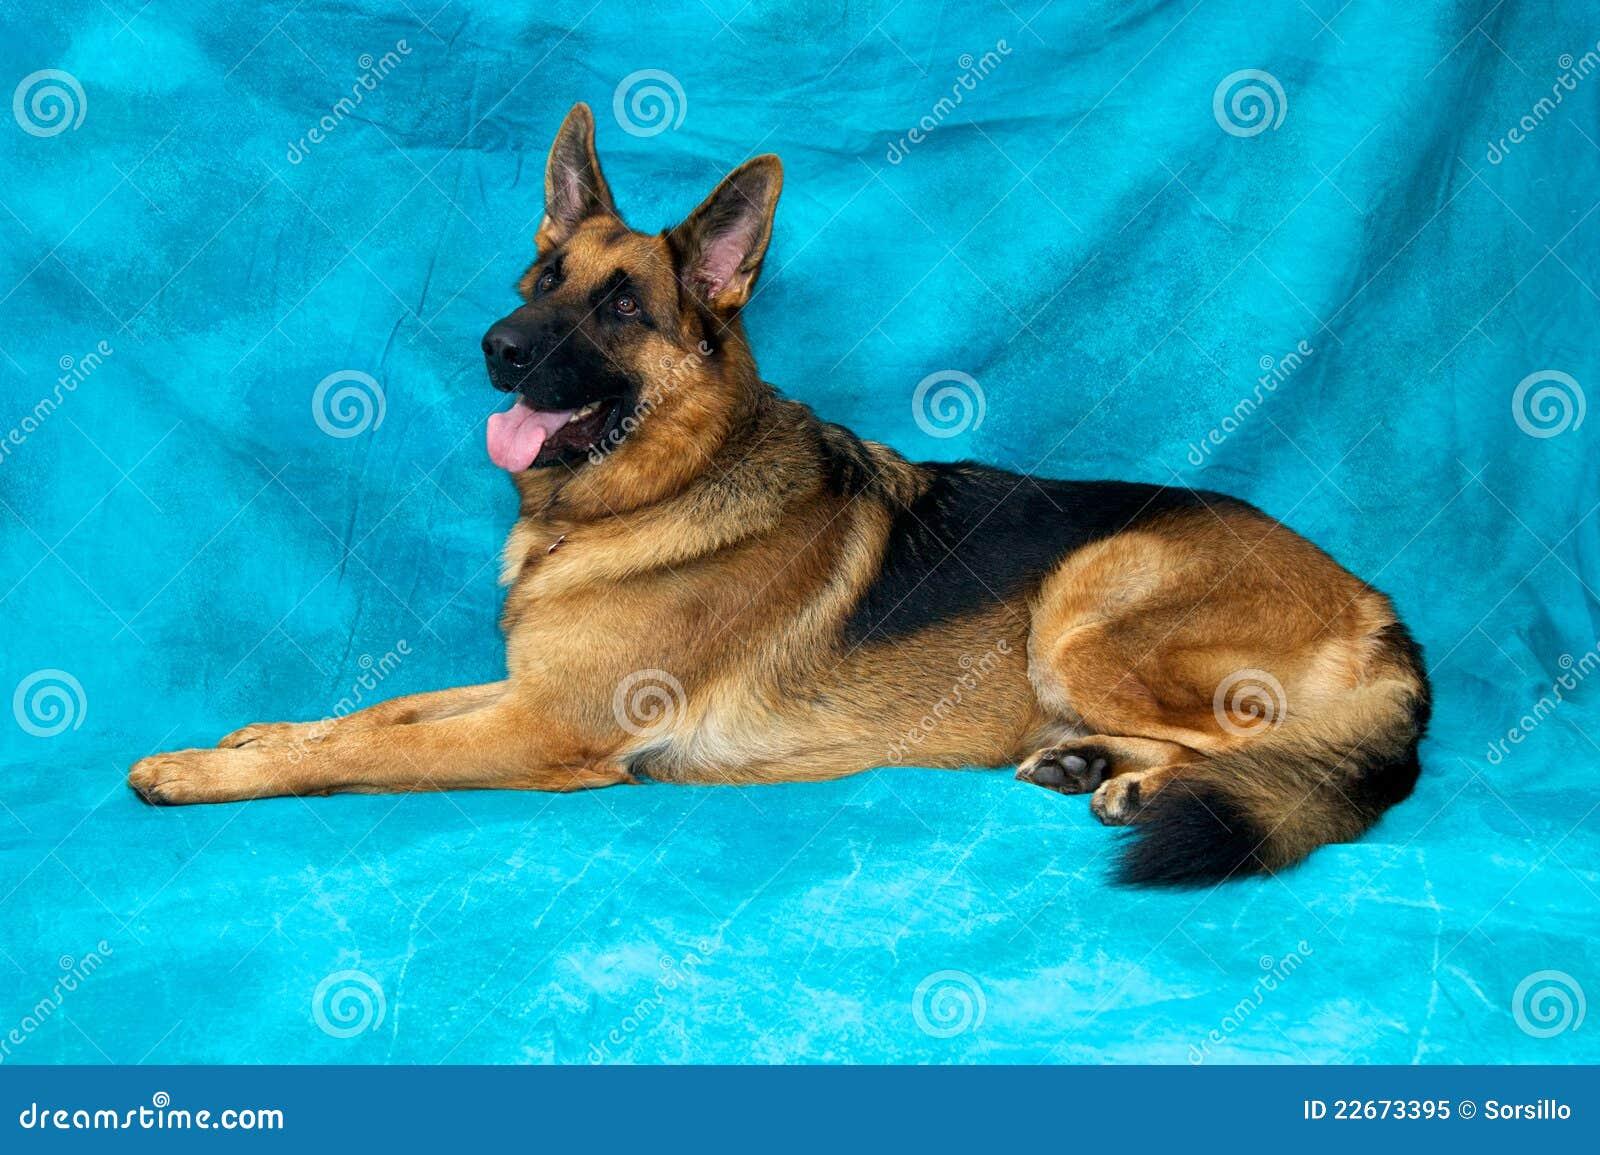 Dog Ear Laying Down